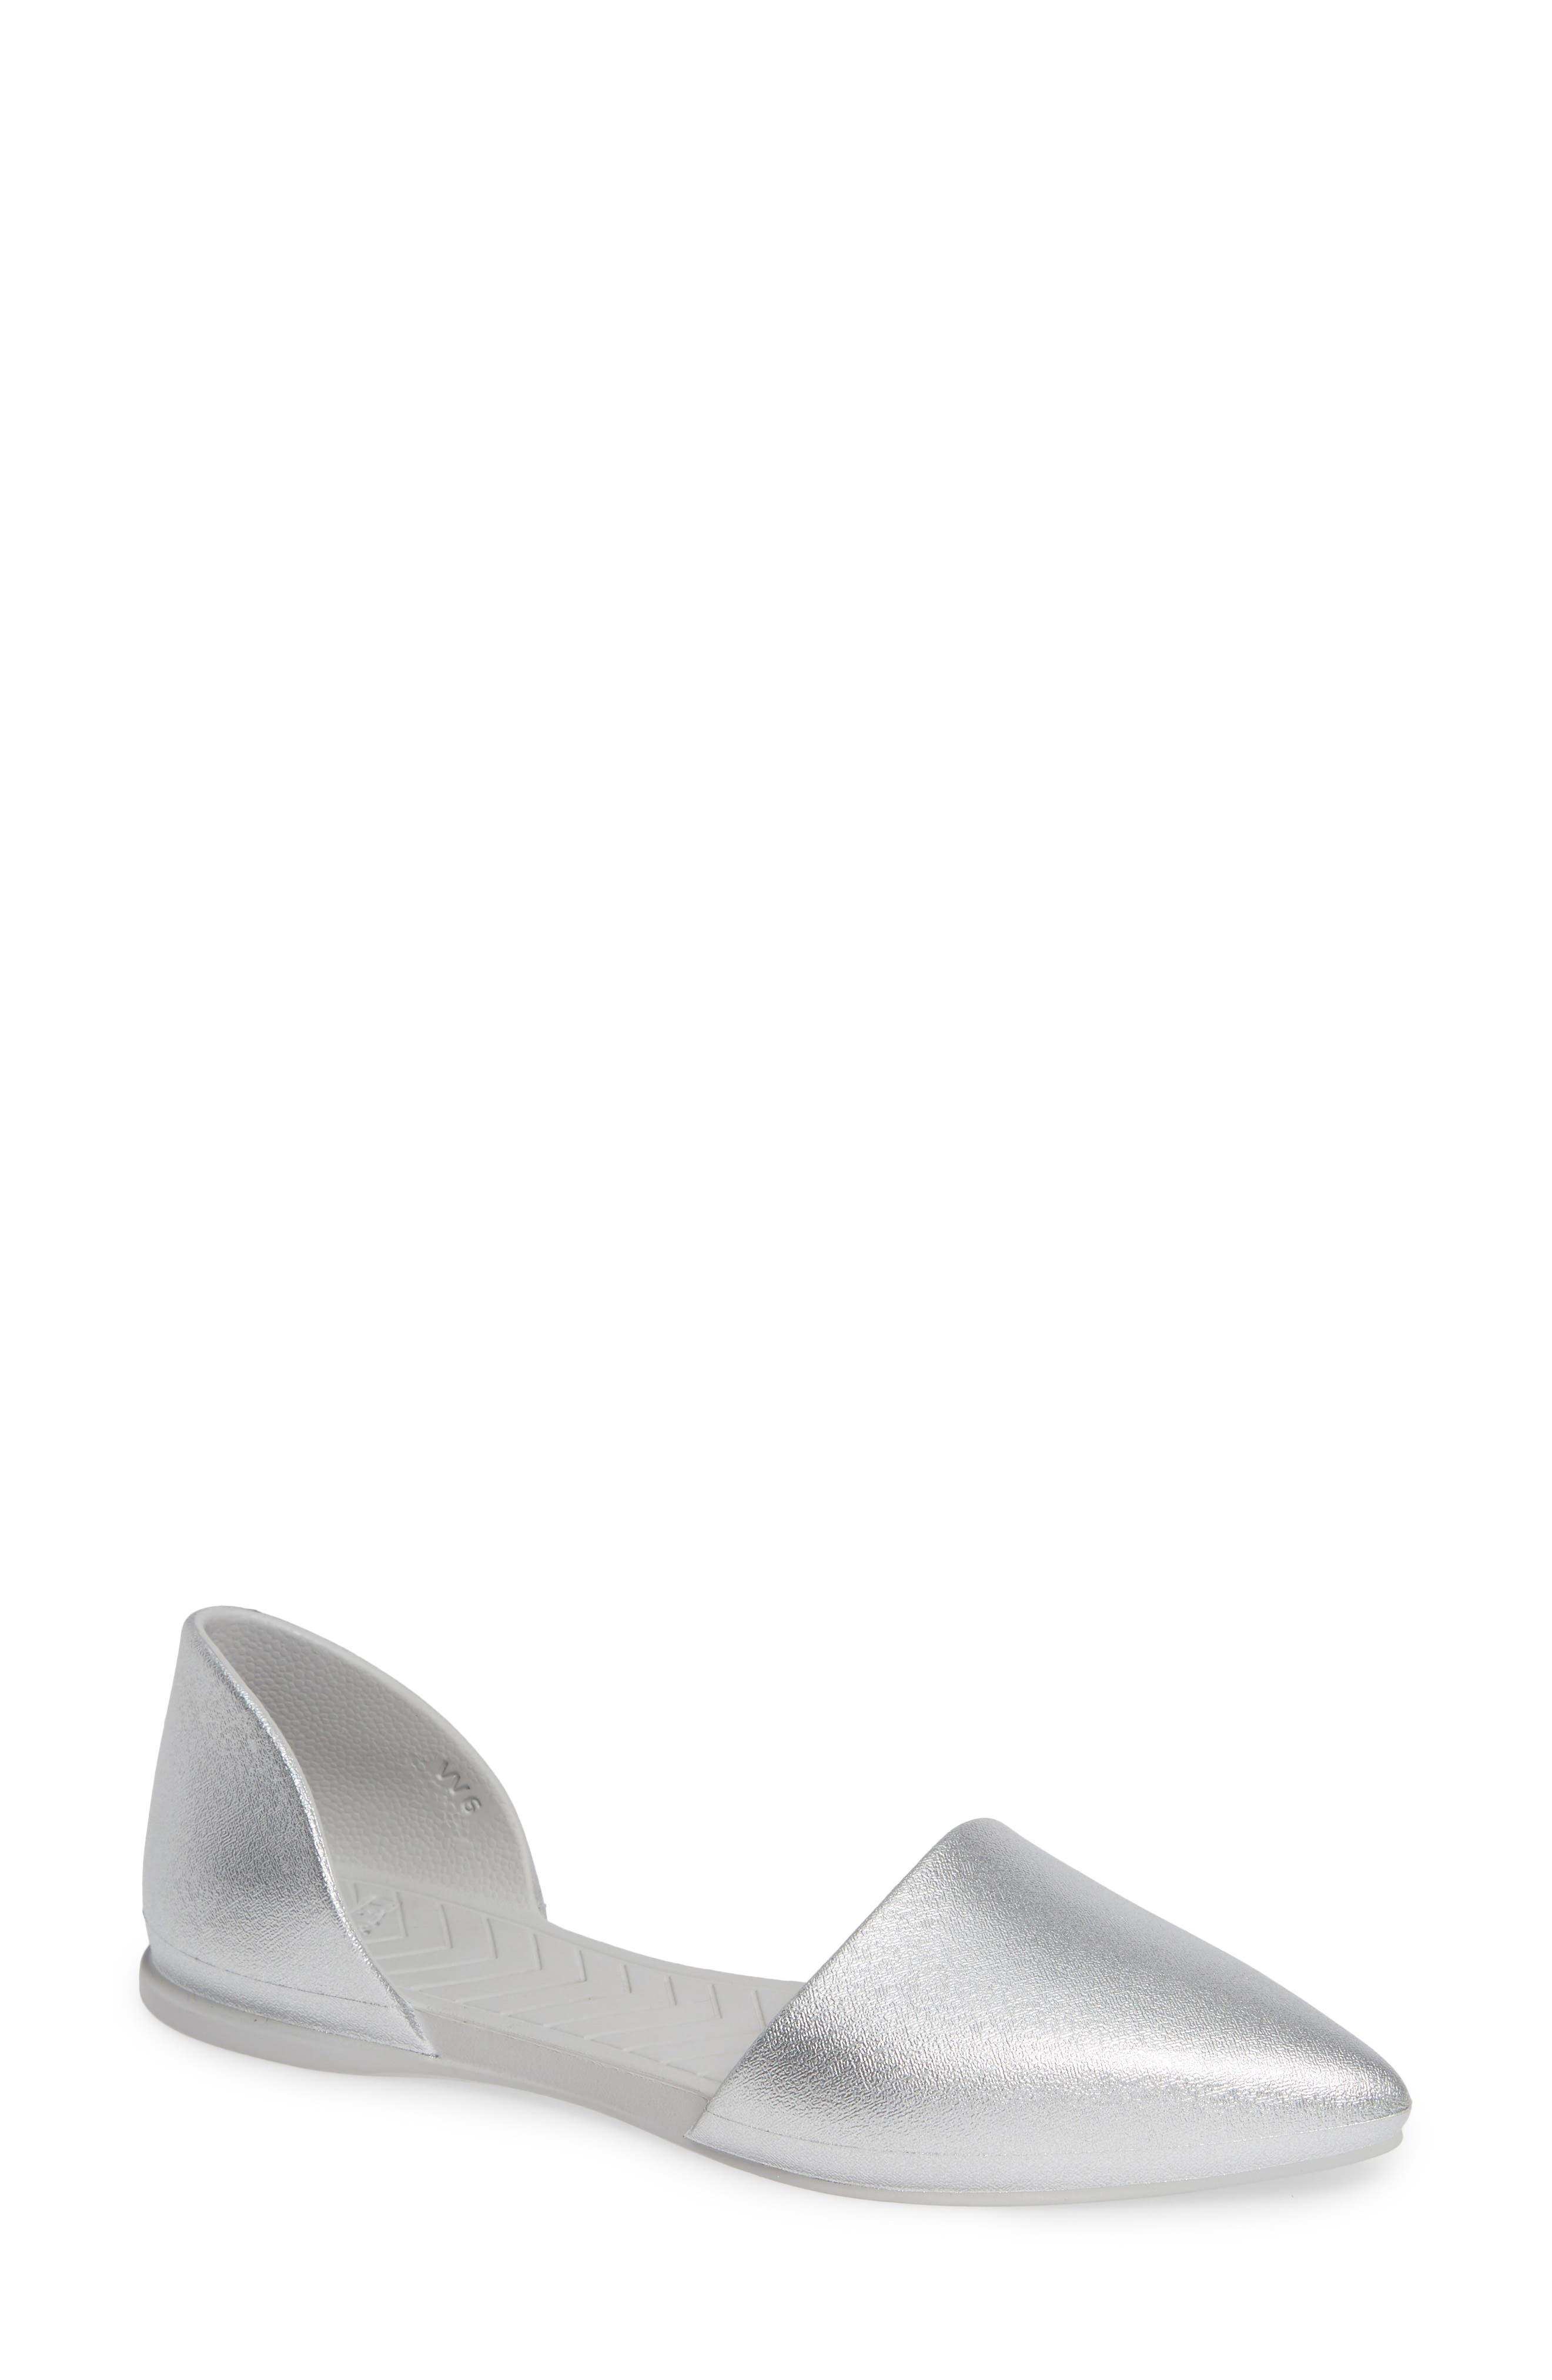 Native Shoes Audrey Vegan Open Sided Flat, Metallic